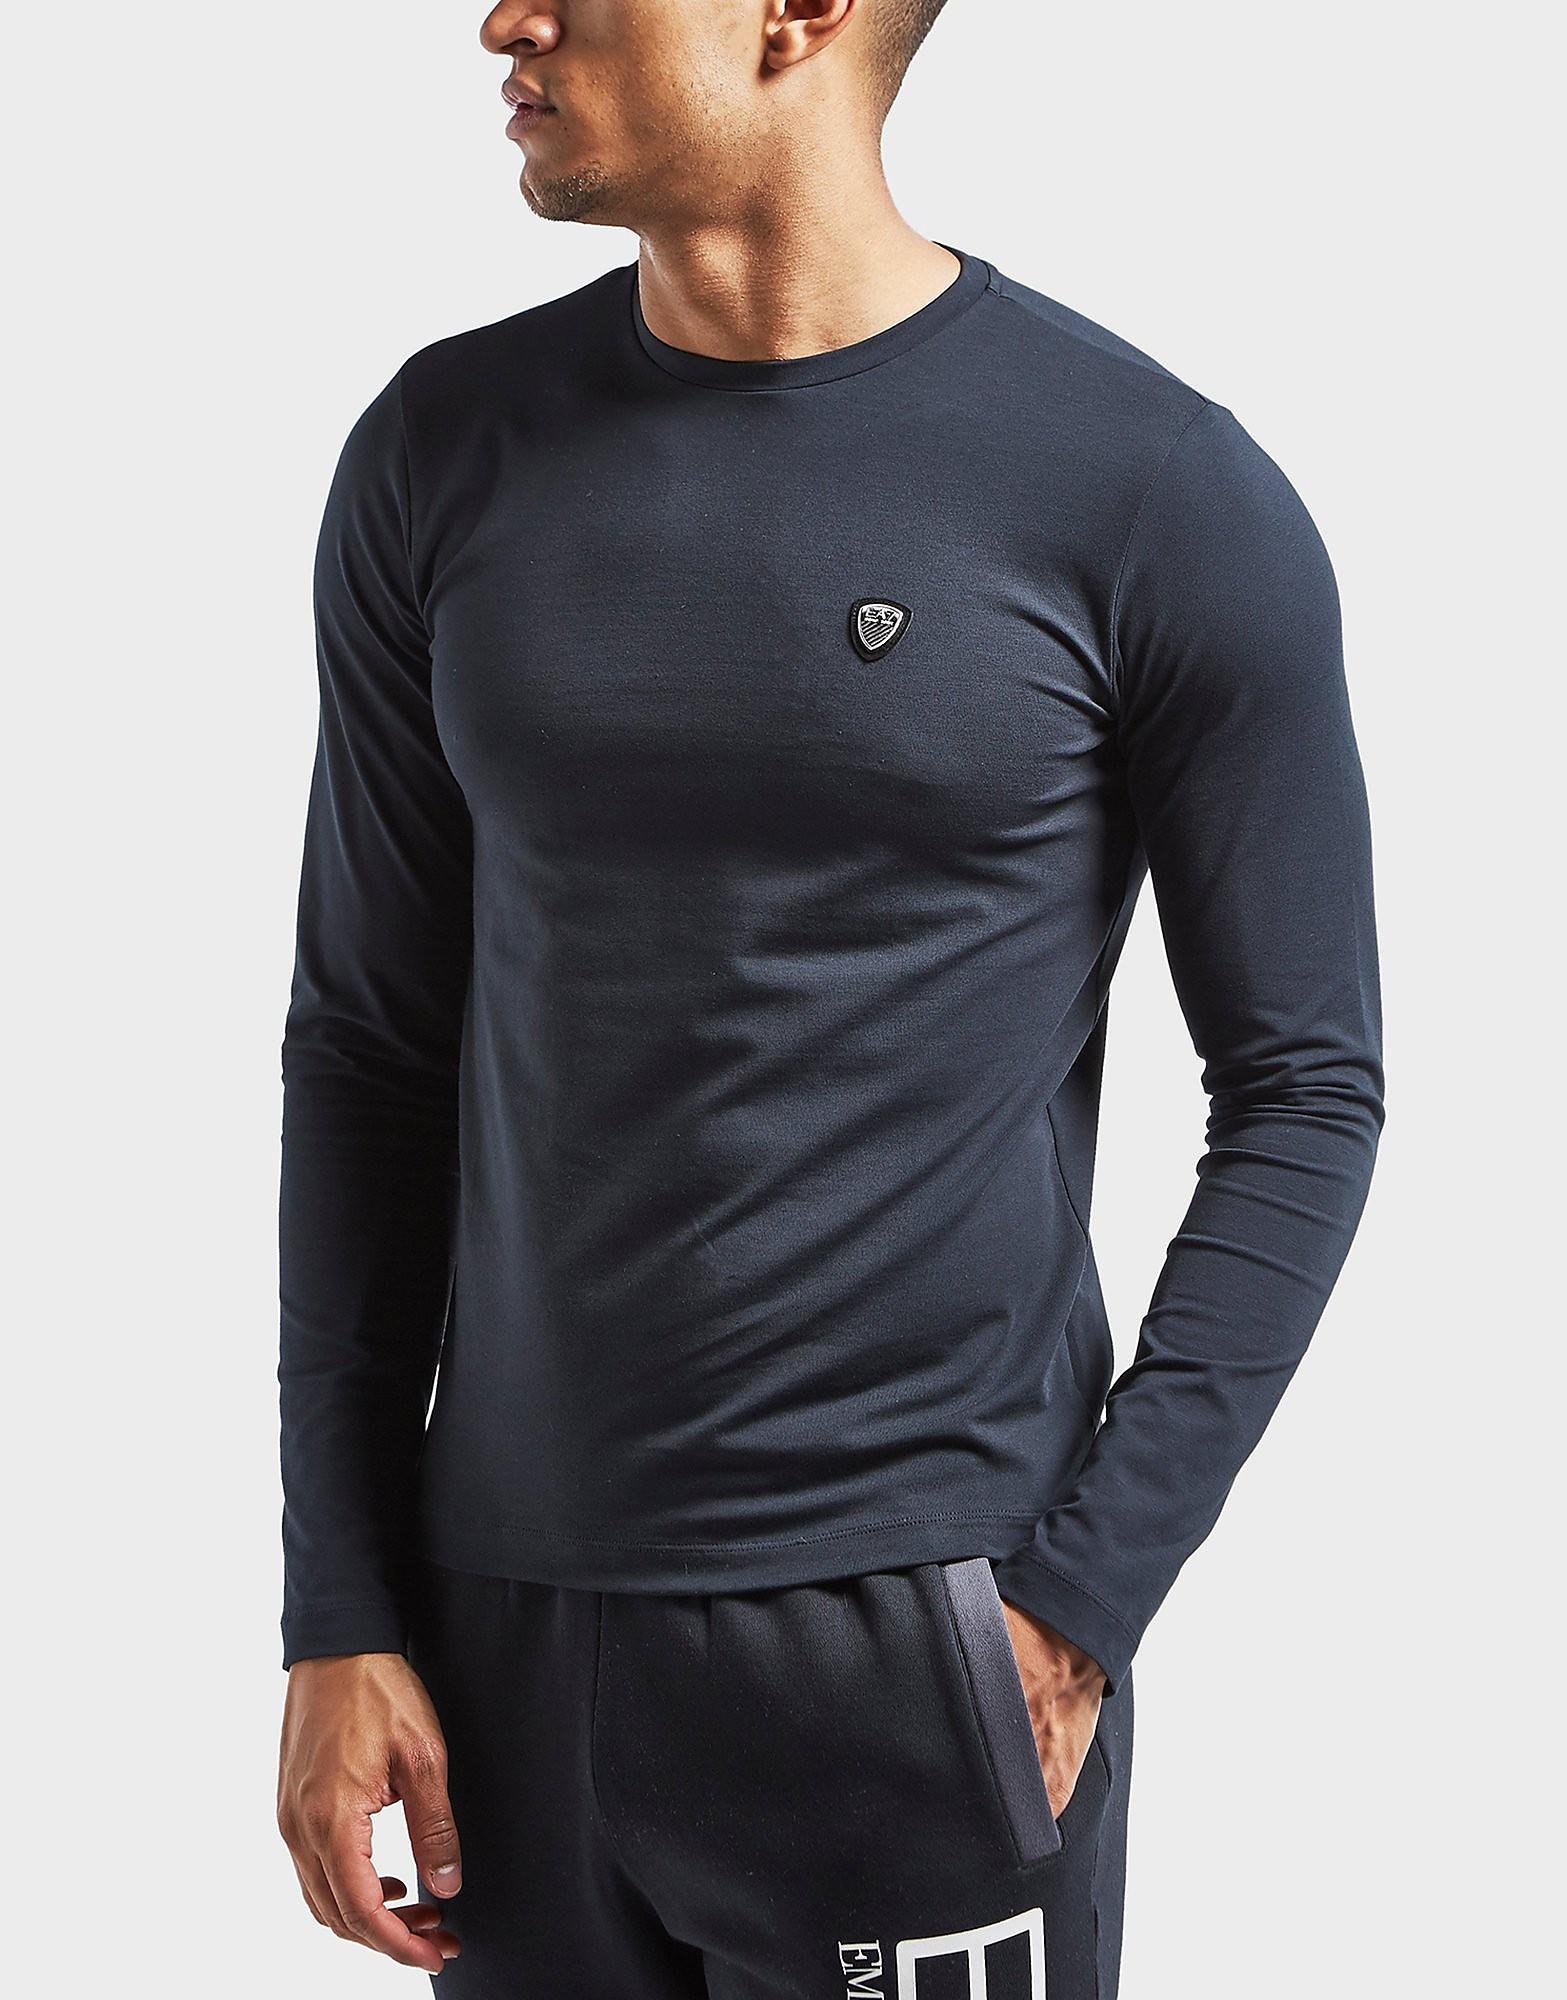 Emporio Armani EA7 Shield Long Sleeve Crew T-Shirt